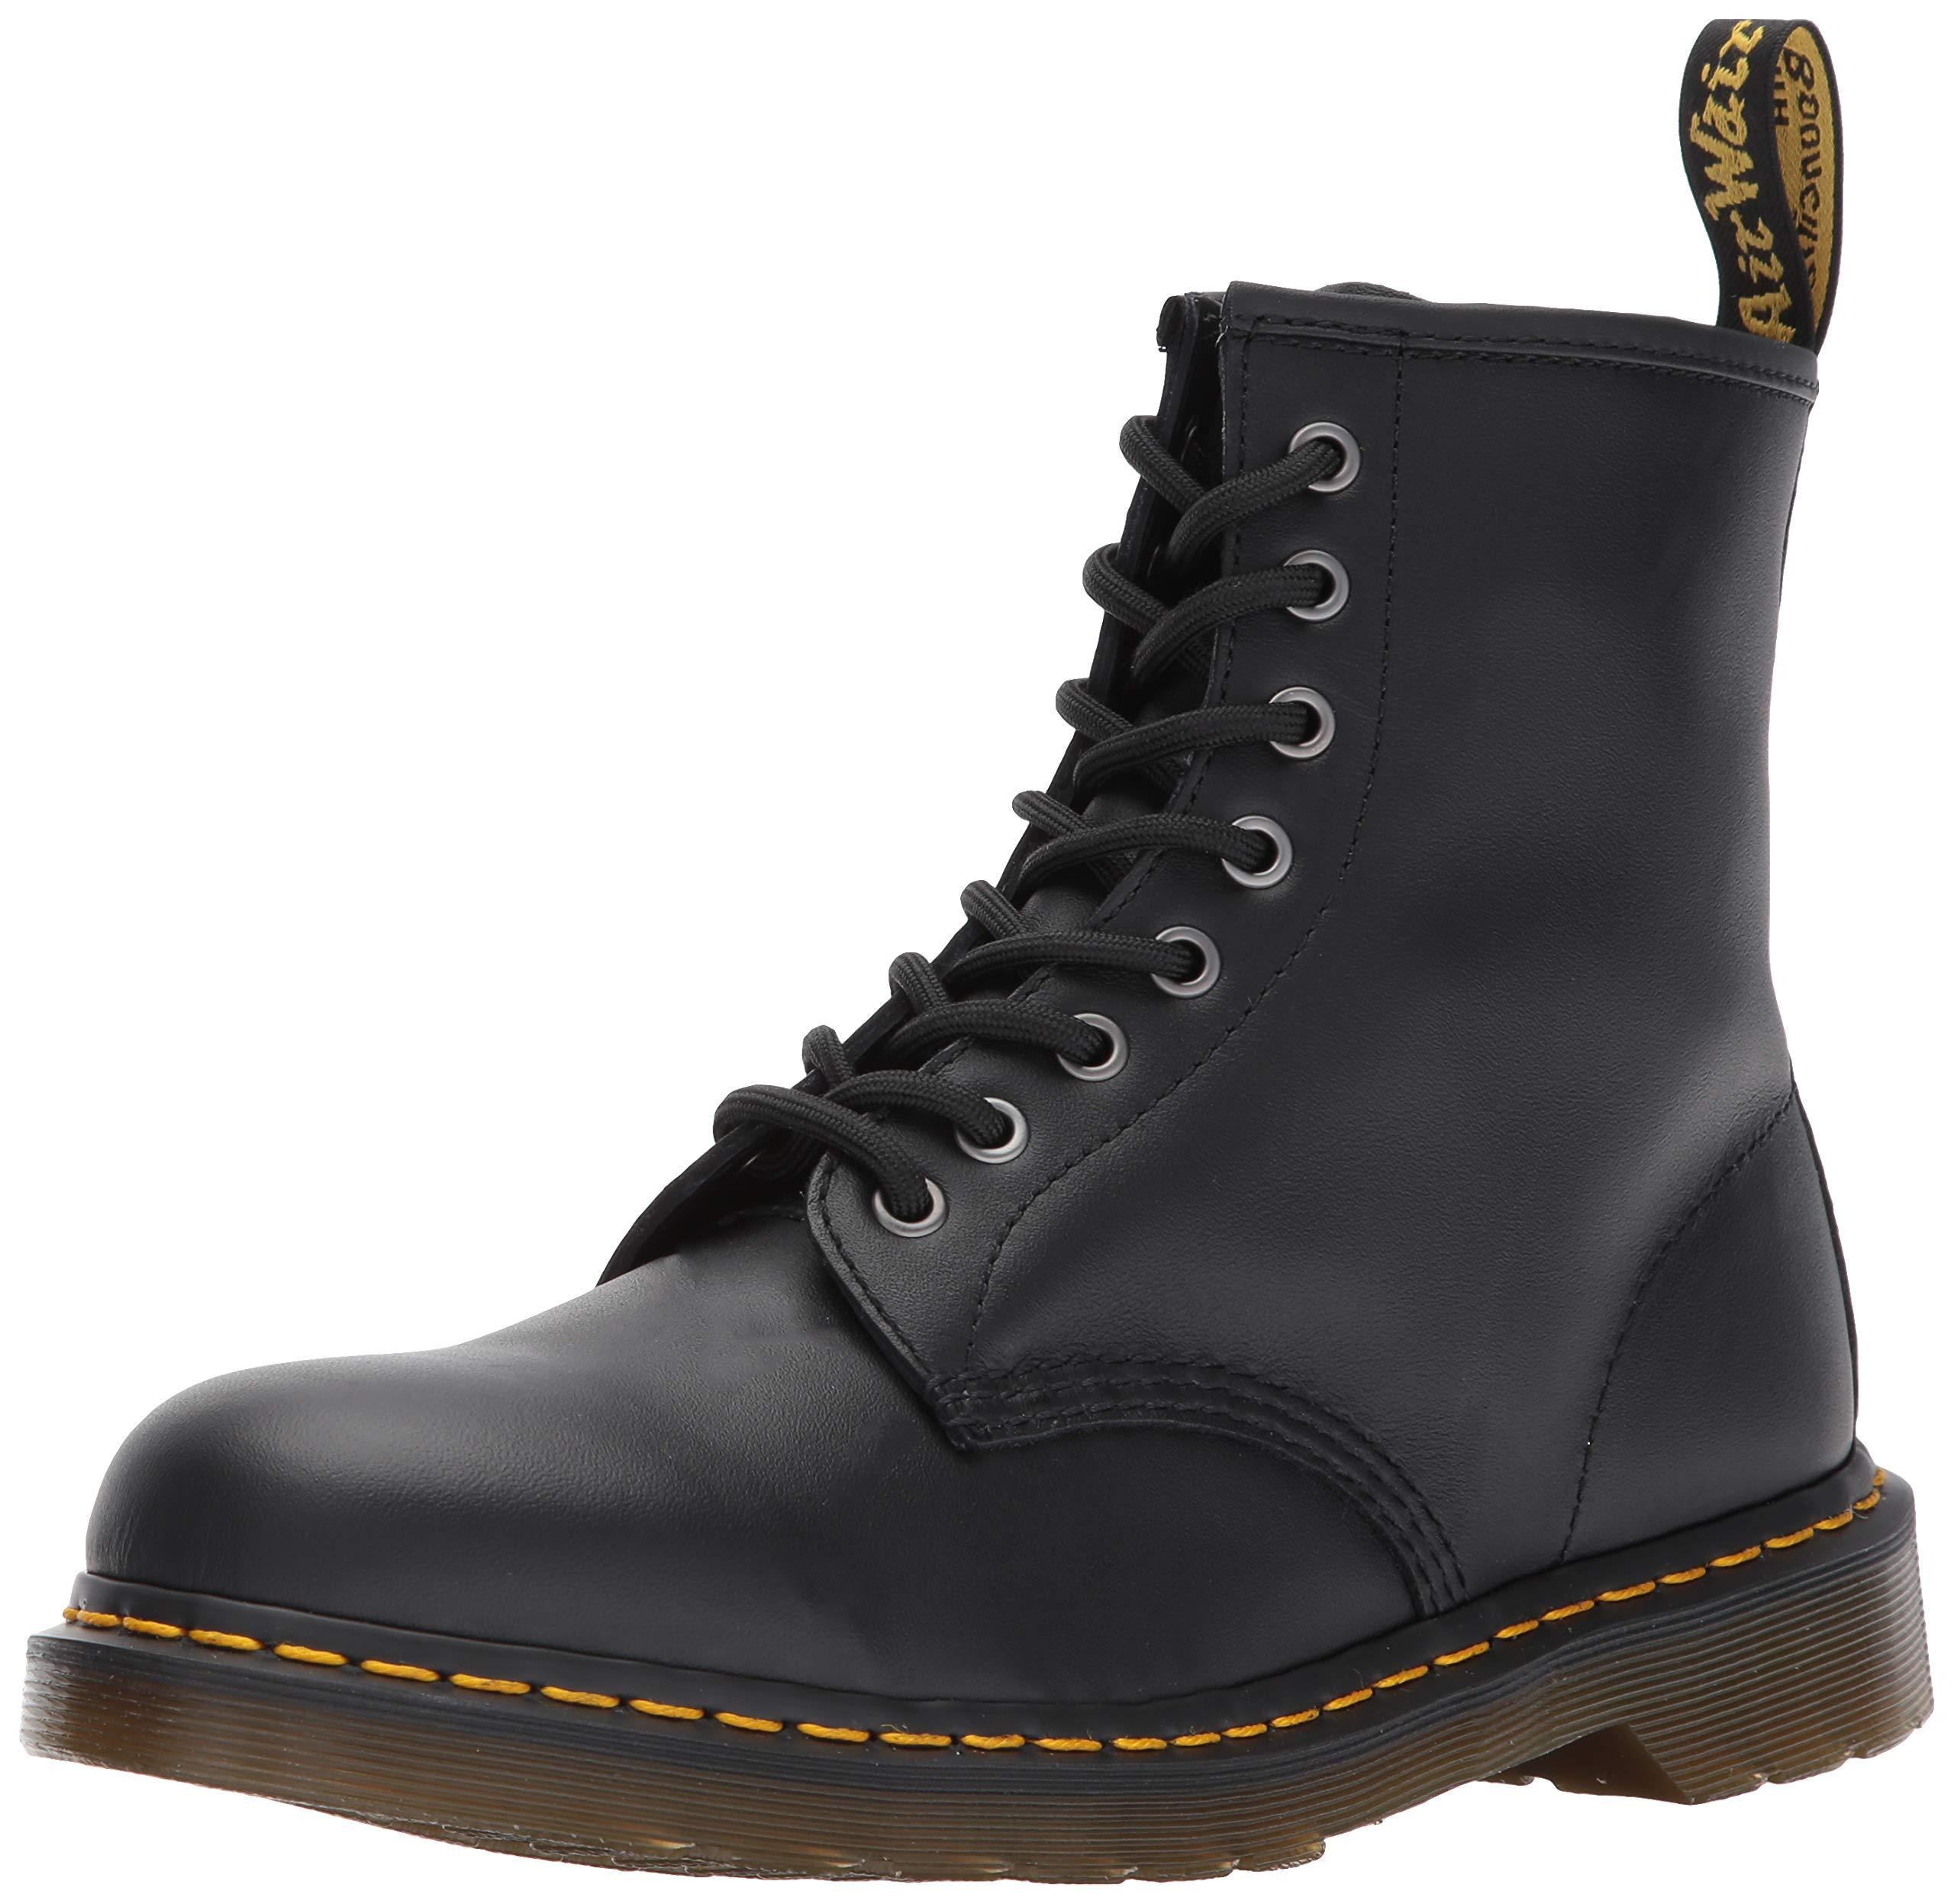 Dr. Martens 1460 Fashion Boot, Black, 10